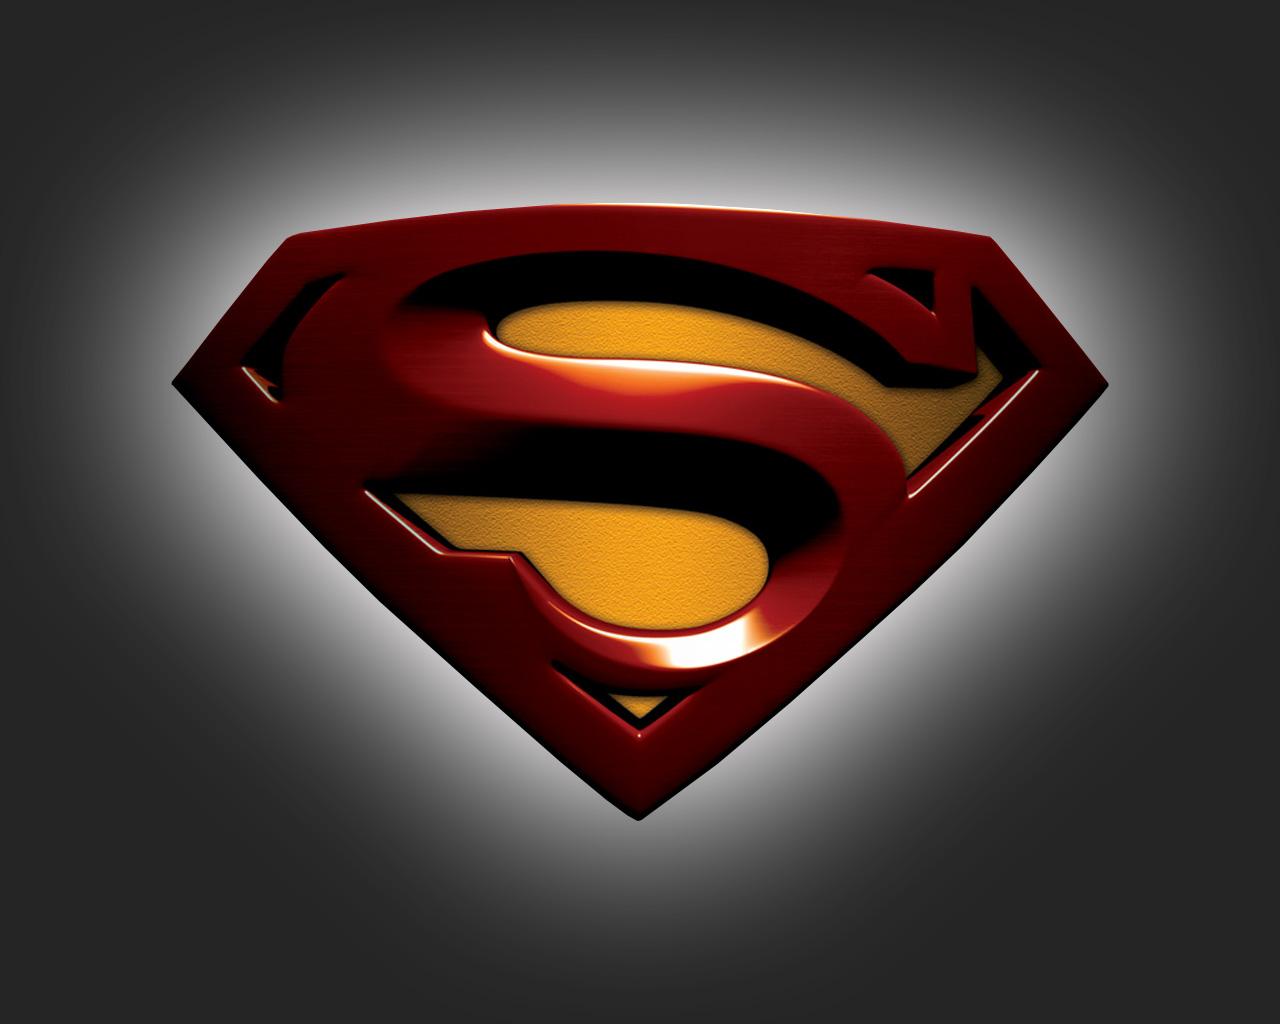 http://3.bp.blogspot.com/-NN5d7CbO94w/Tmp6Ozq09vI/AAAAAAAAEY4/WH09IwHIDoo/s1600/superman+wallpaper+hd+1.jpg